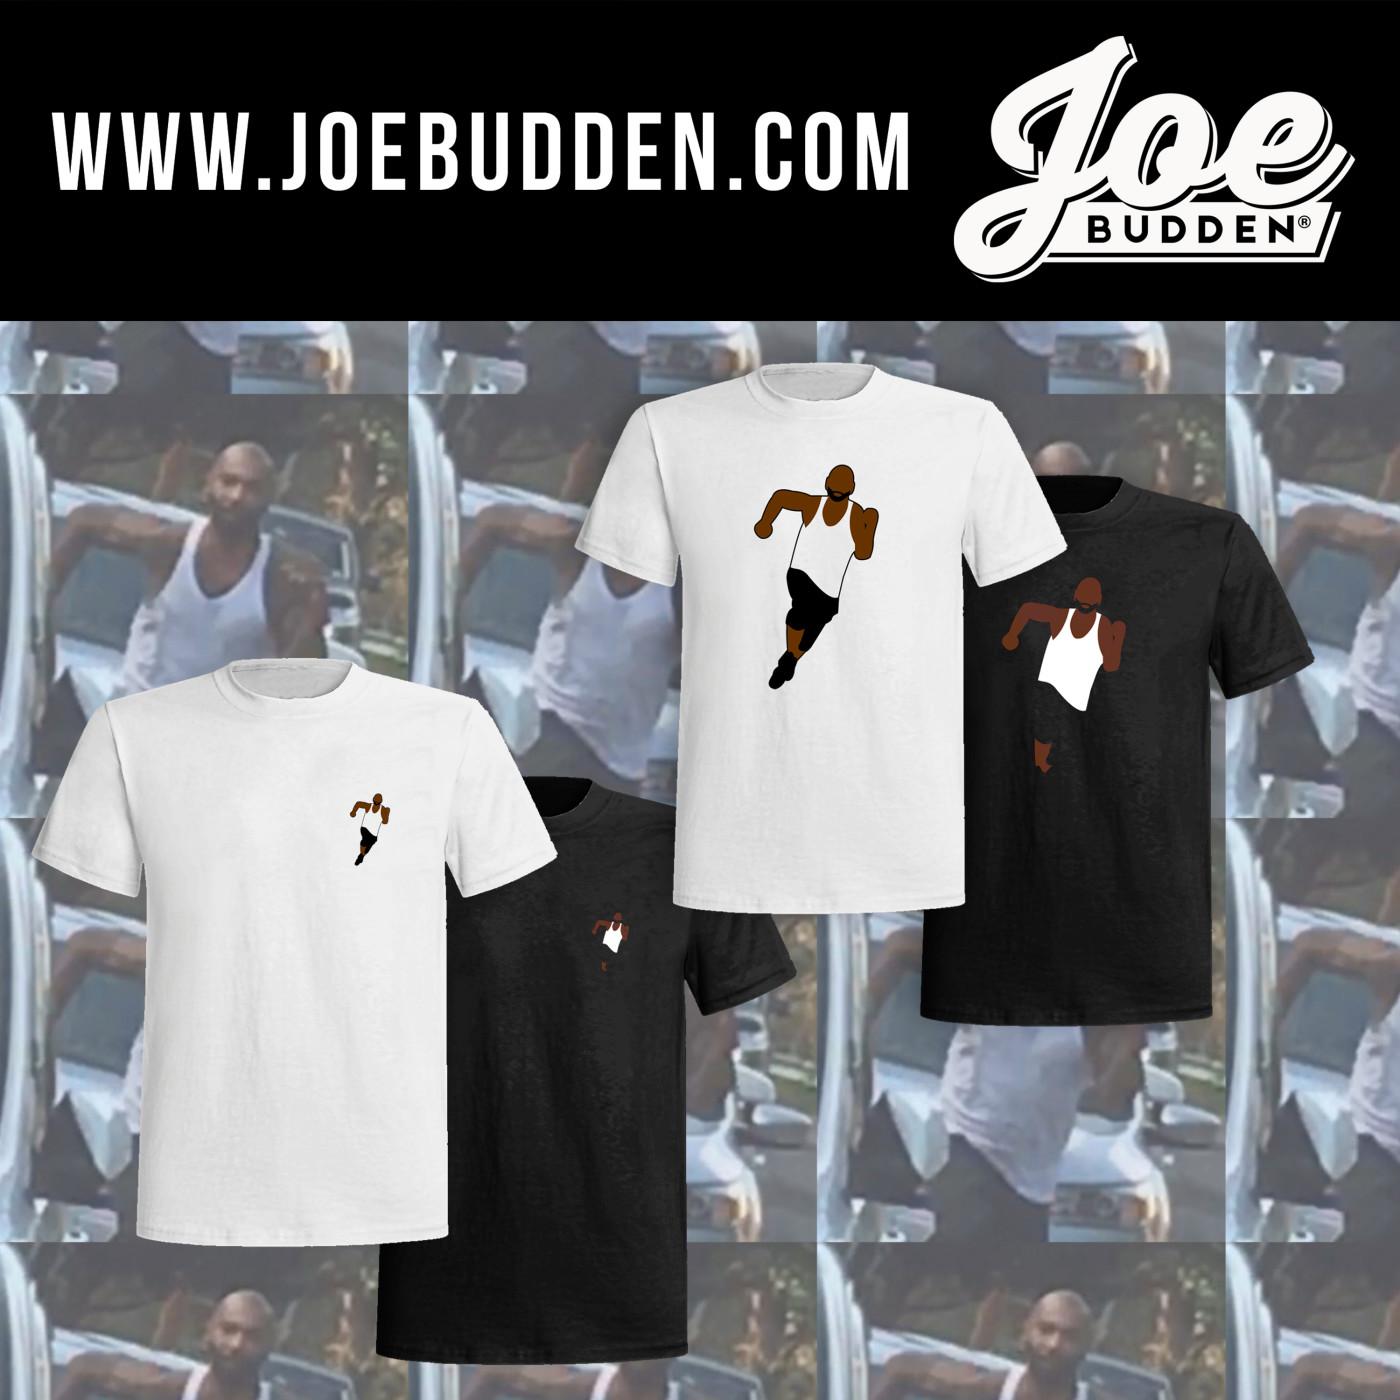 Joe Budden Drake Feud Merch, Shirts